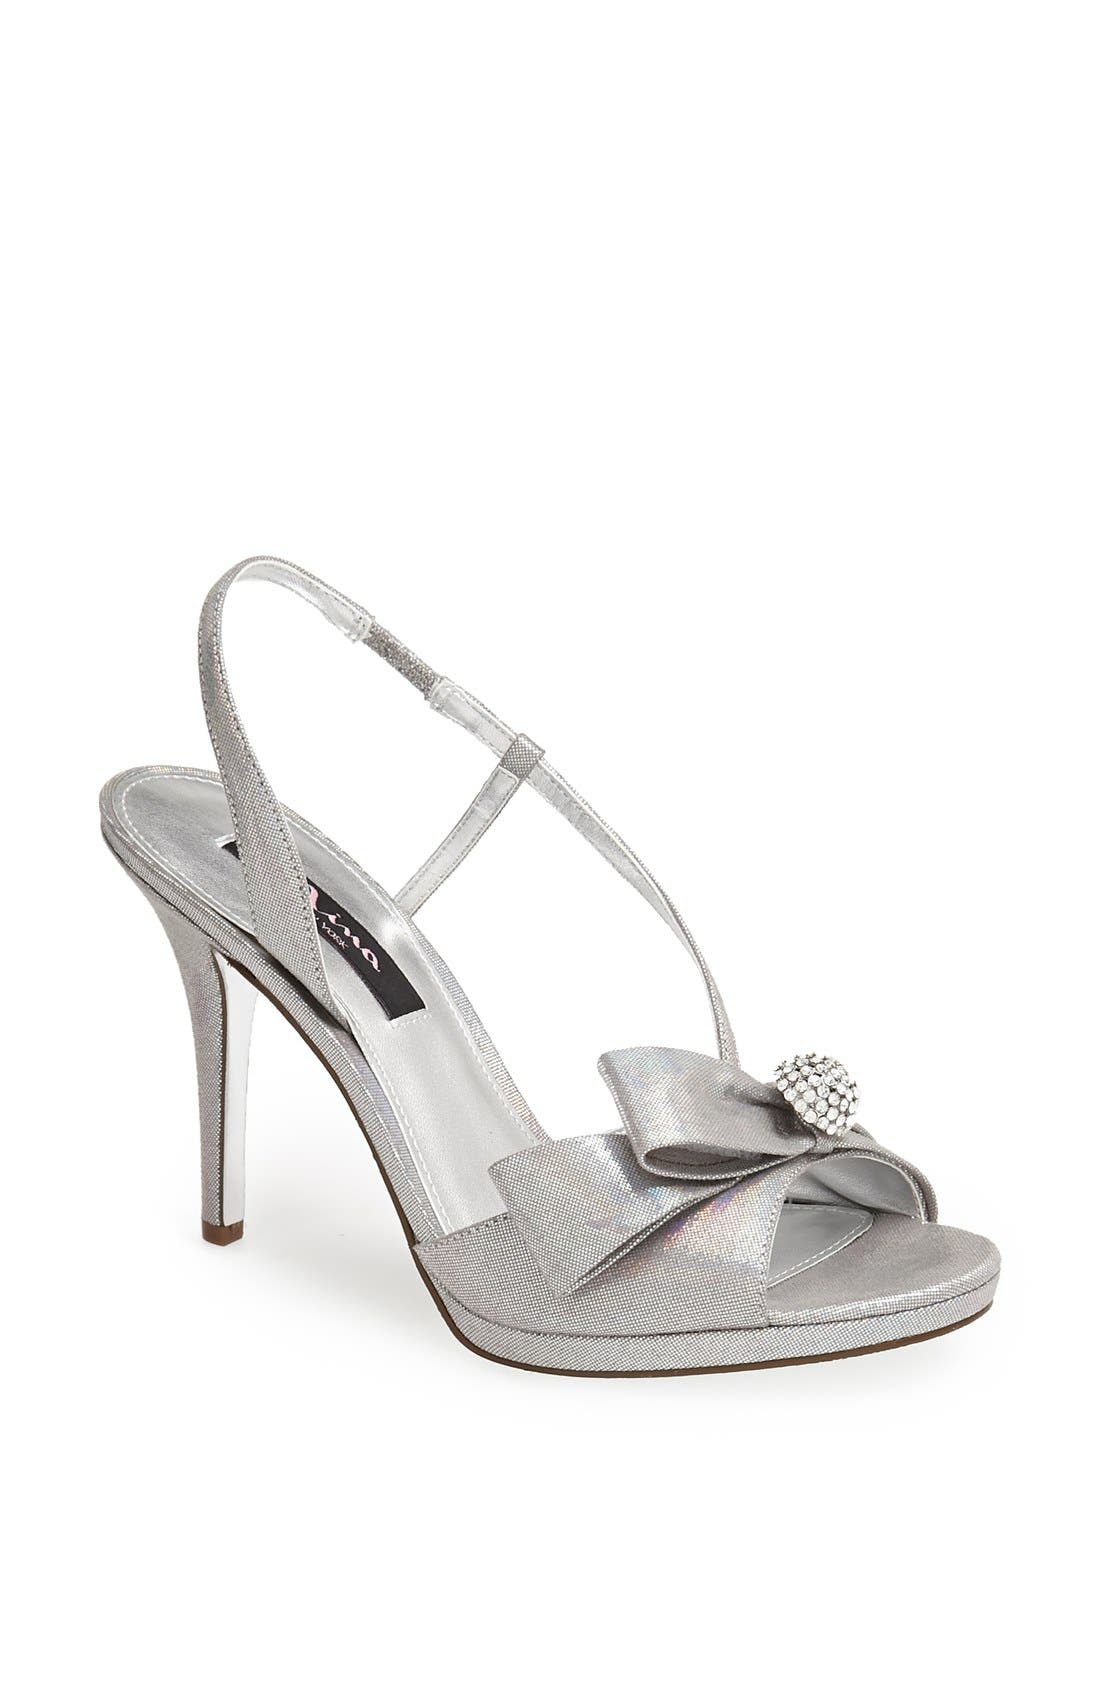 Main Image - Nina 'Roslyn' Sandal